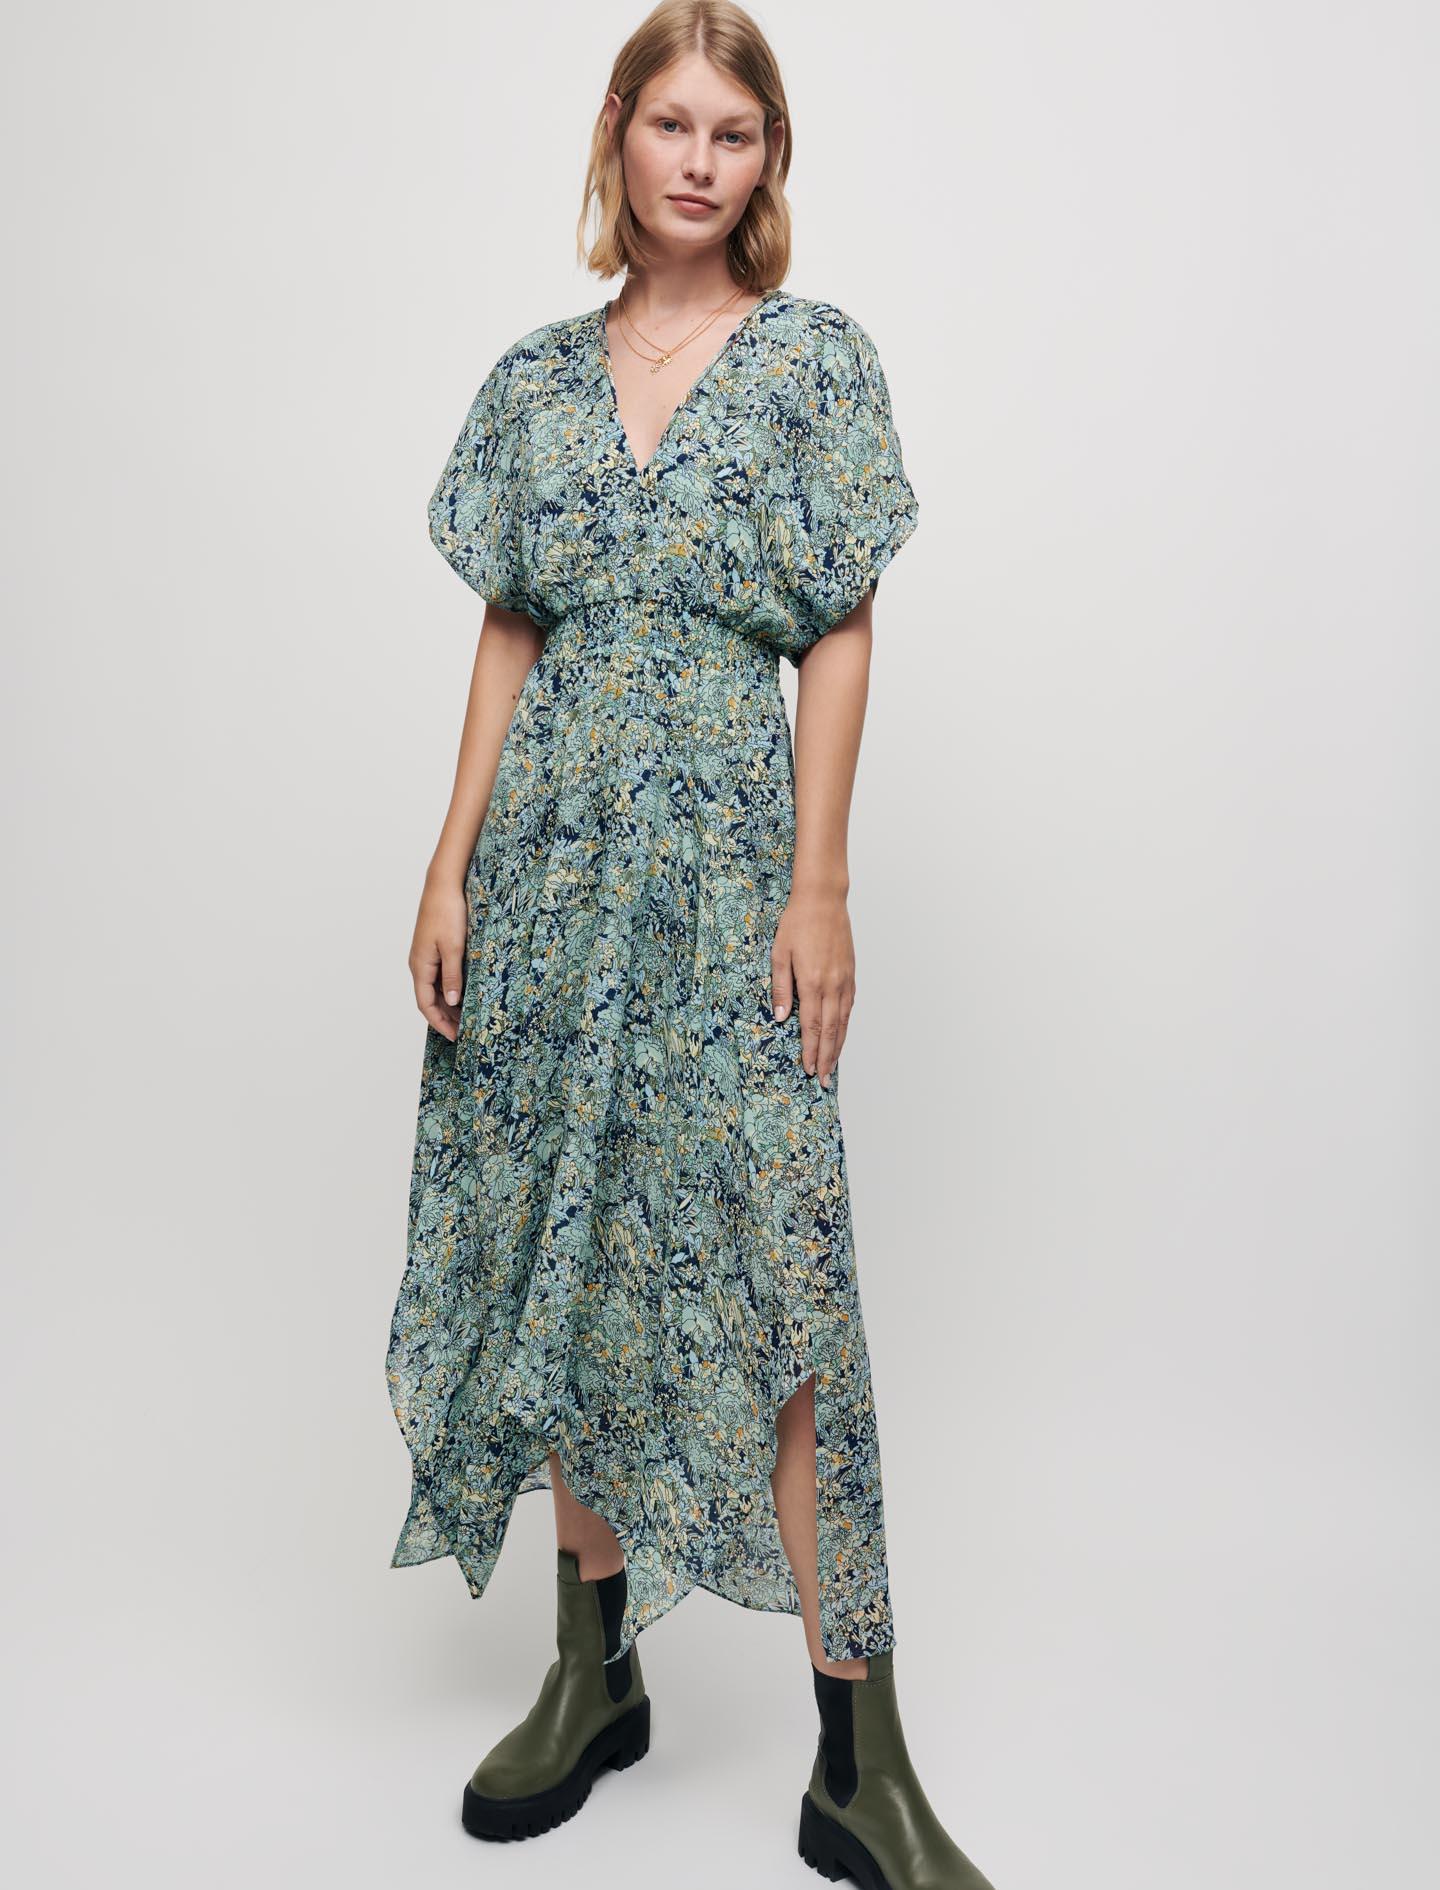 Printed chiffon scarf dress - Celadon